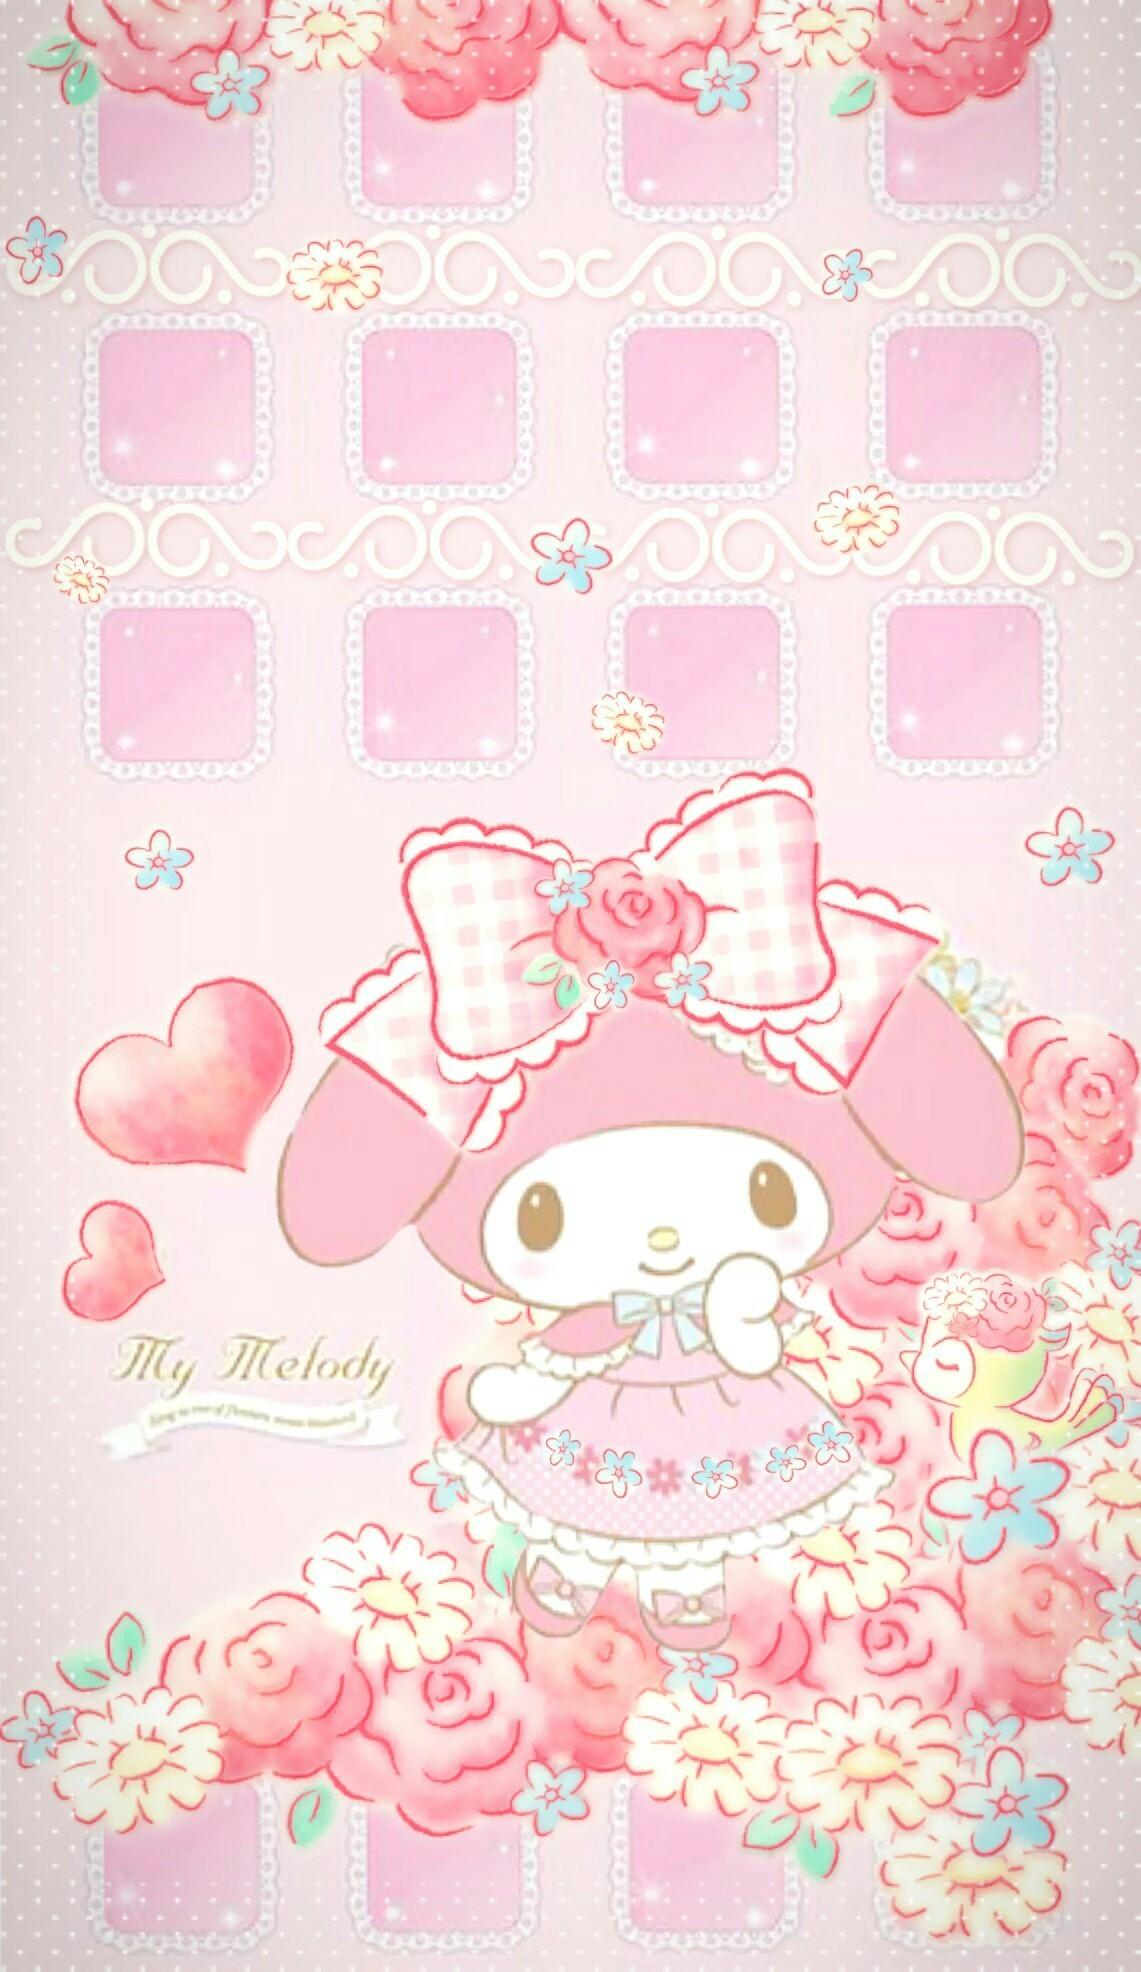 Emoticons Cute Wallpaper My Melody Wallpaper 183 ①